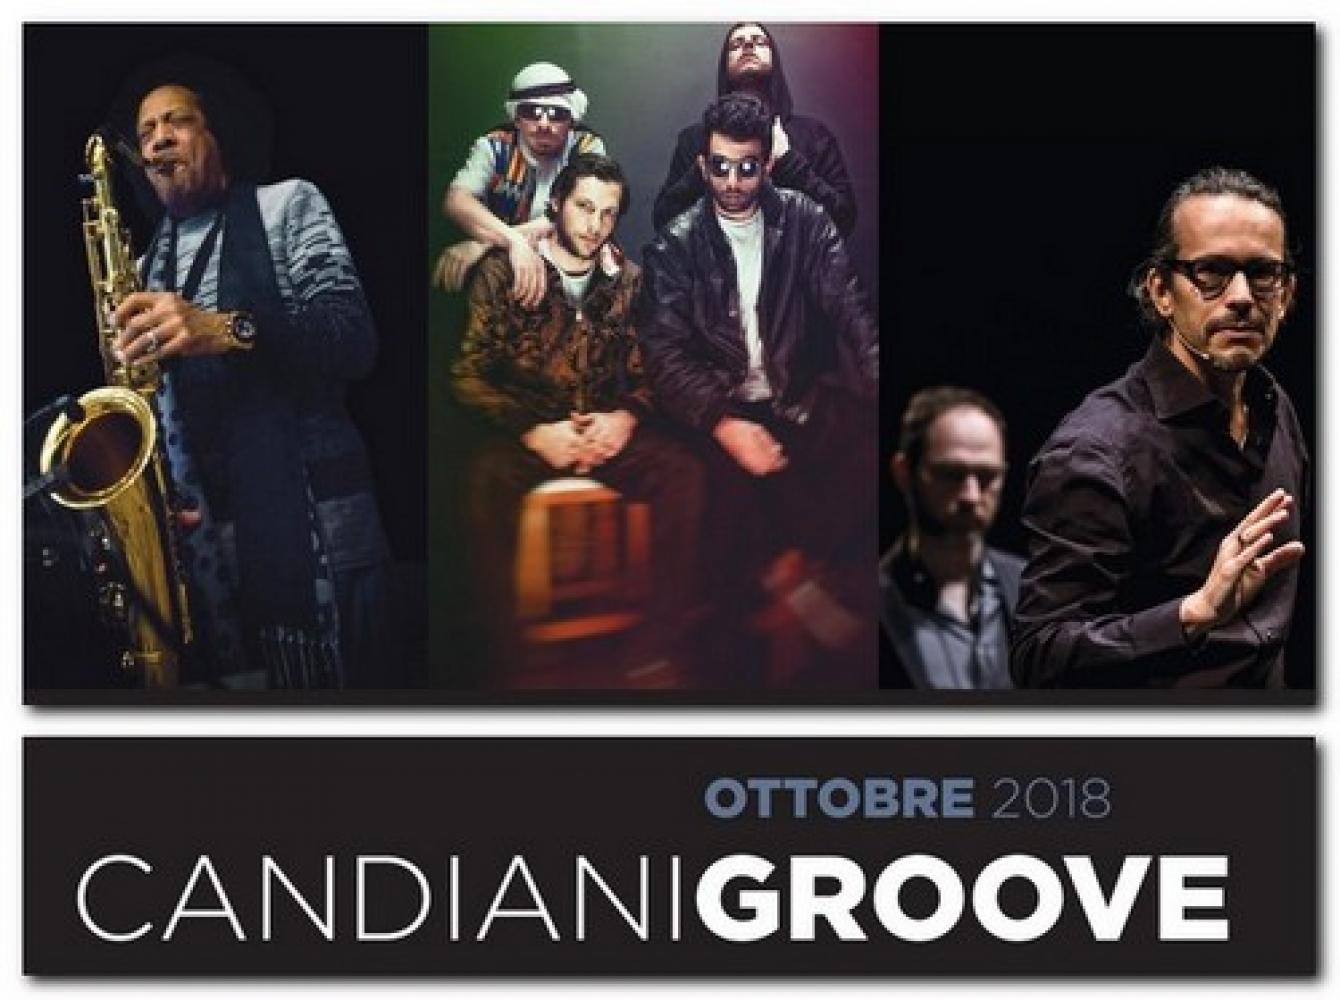 Candiani Groove ottobre 2018